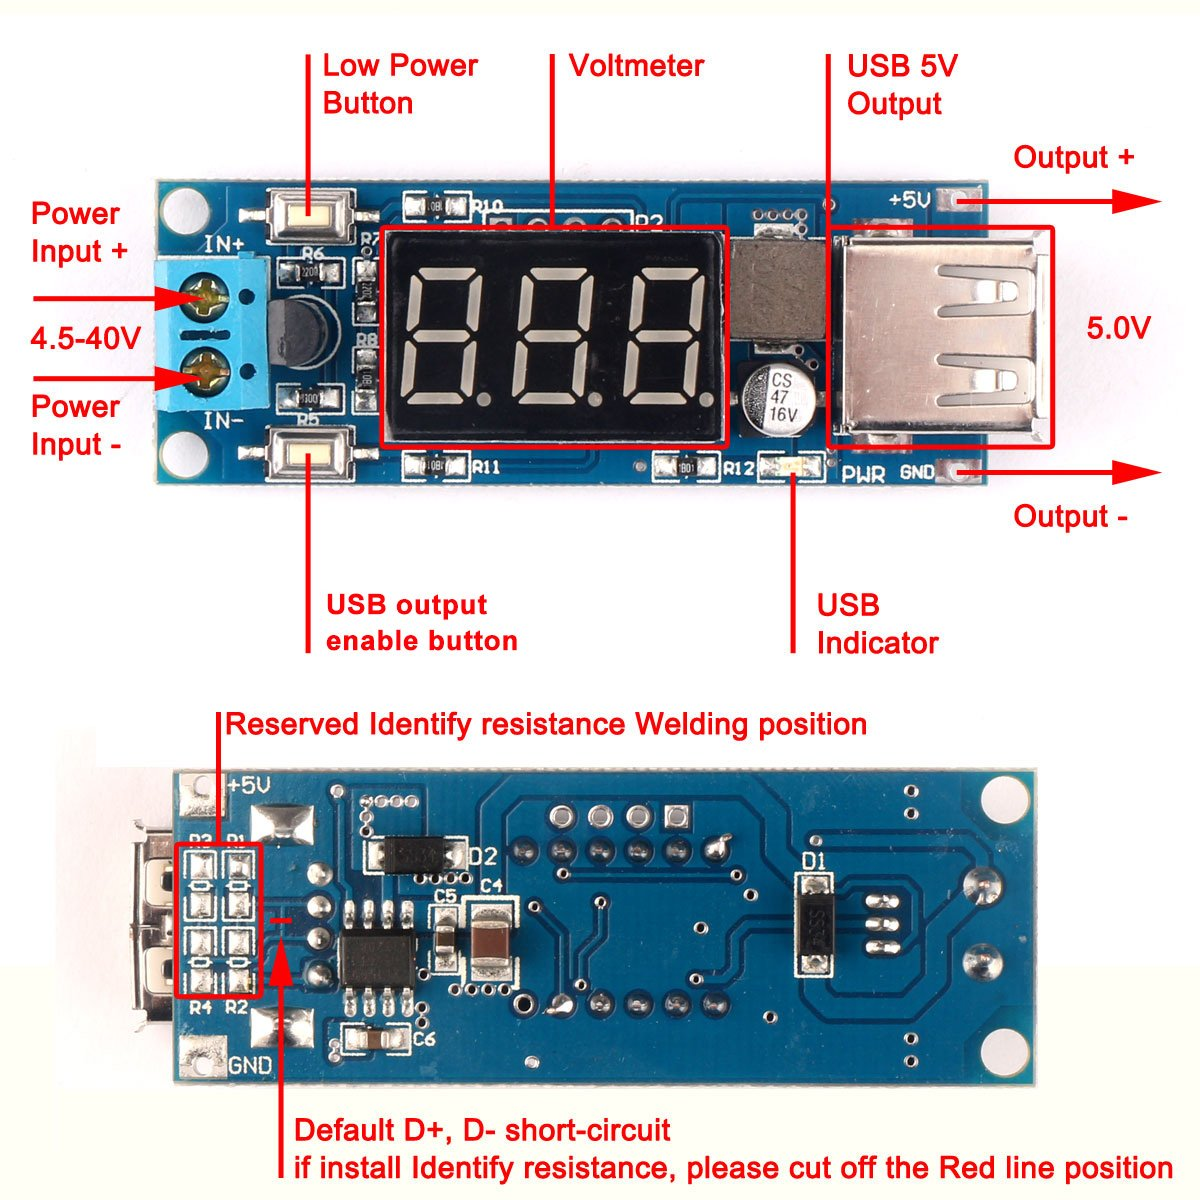 Drok Dc Buck Voltage Converter 45 12v To 5v 2a Step Electronics Technology 5vdc 12vdc Lt1070 Boost Circuit Down Volt Transformer Stabilizer Regulator Module Industrial Scientific